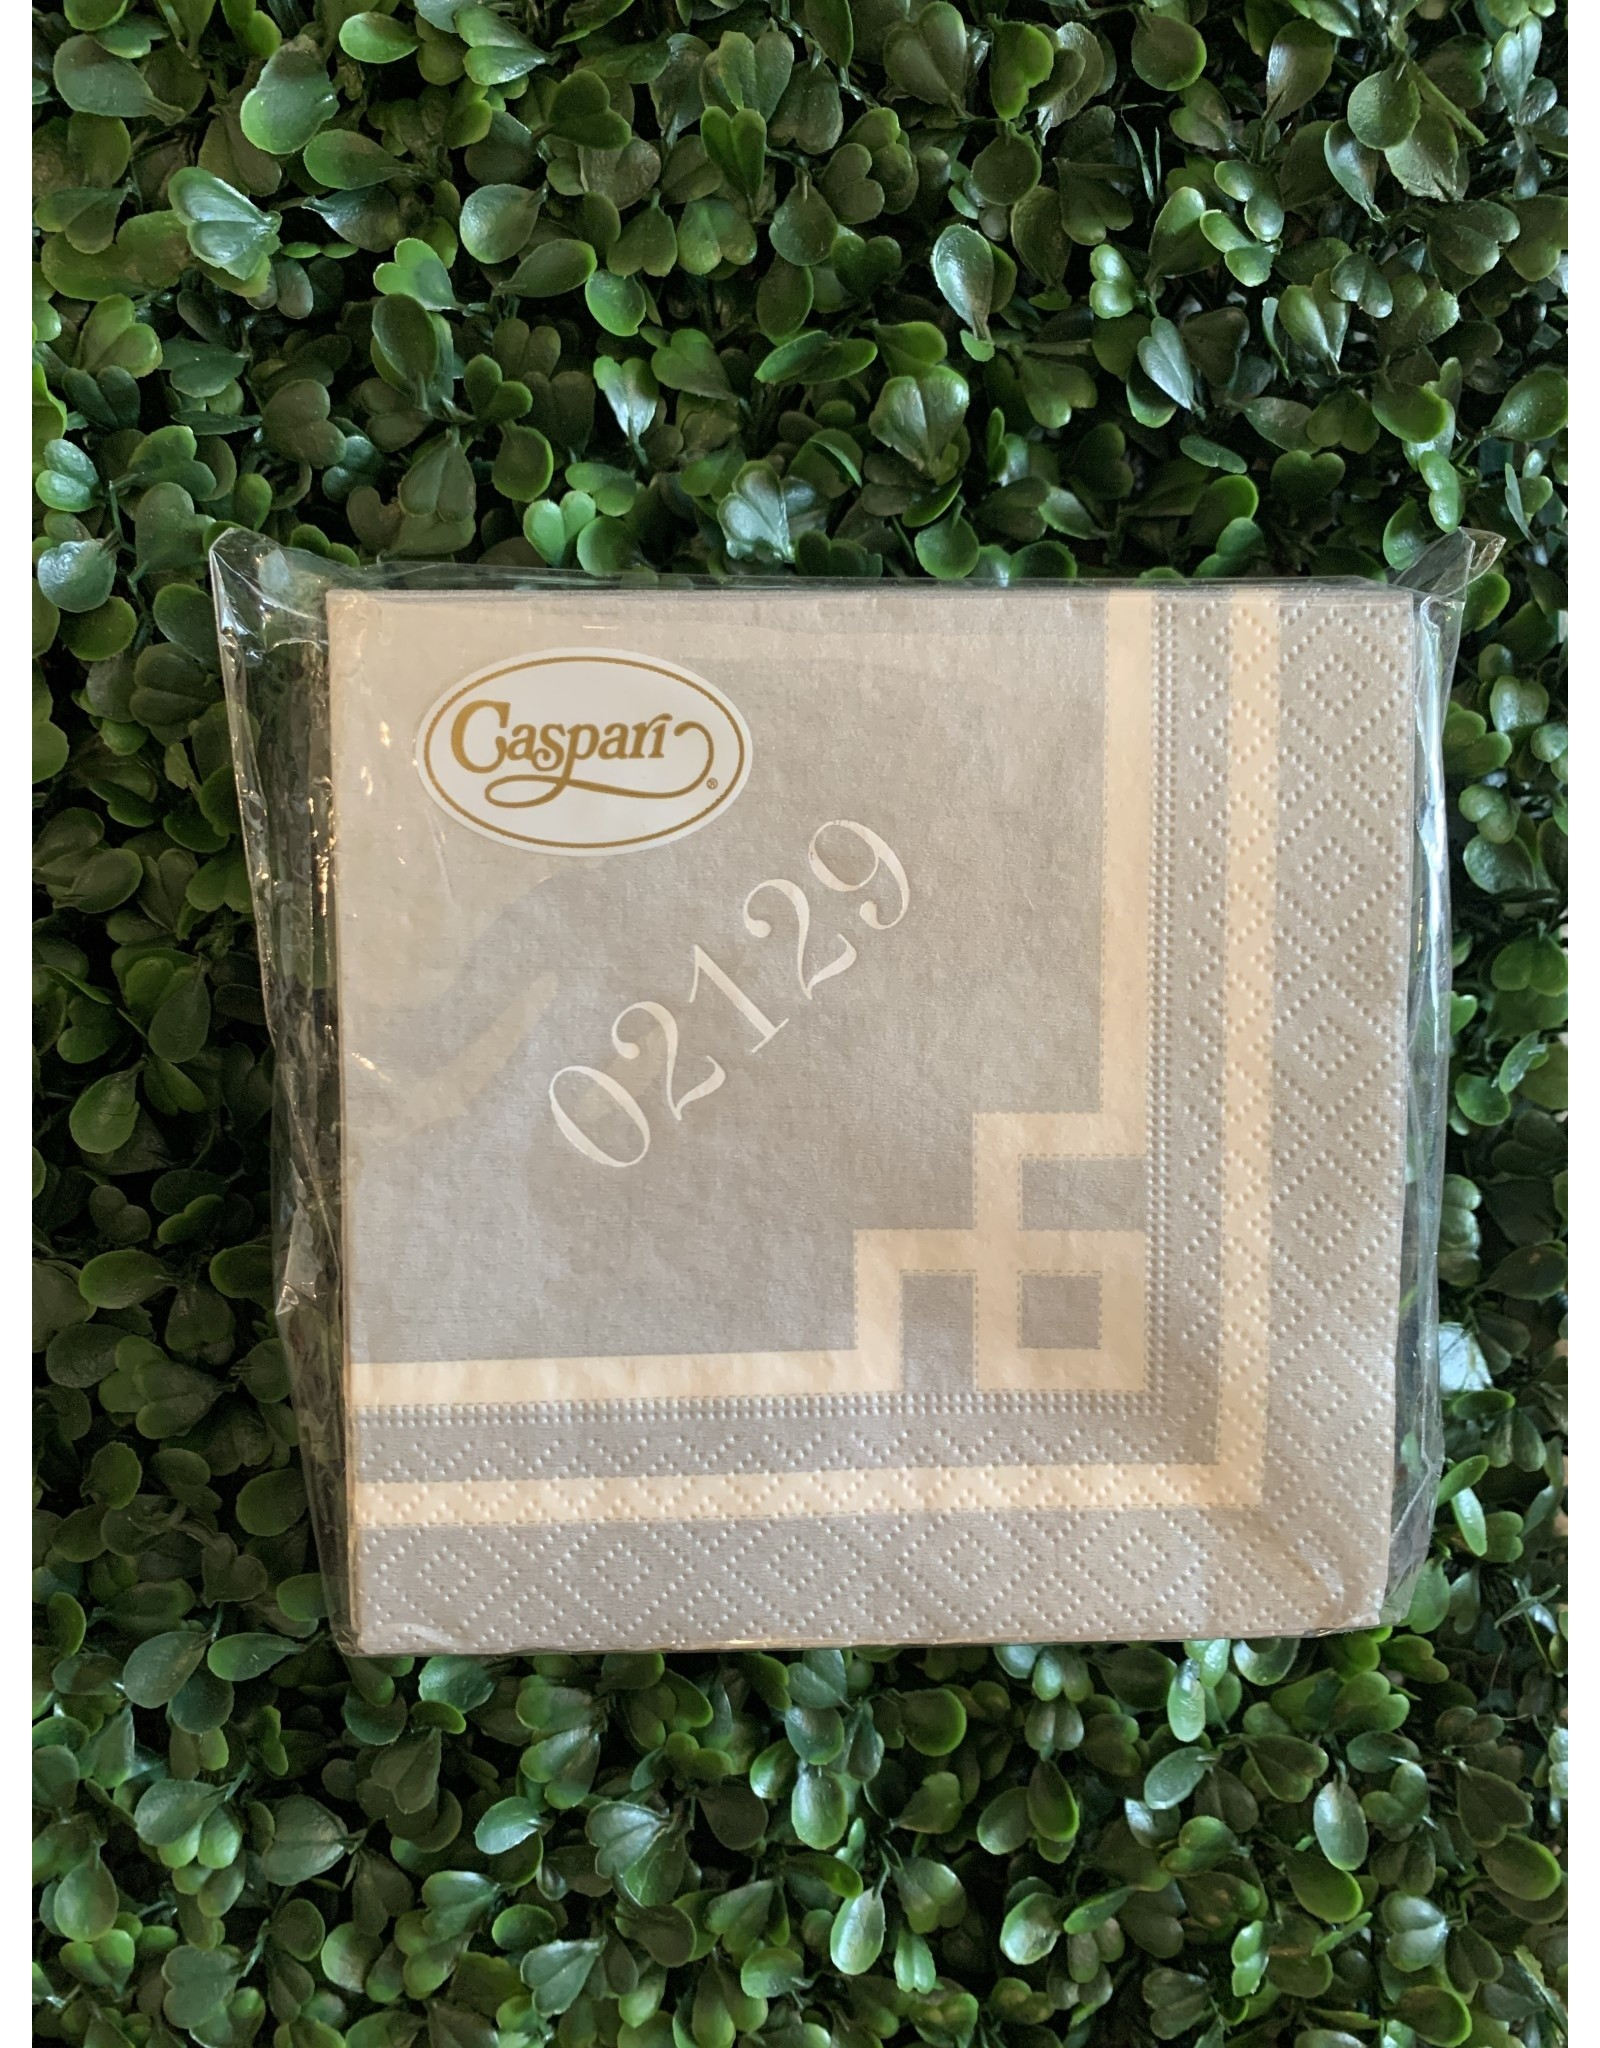 Caspari 02129 Greek Key Ivory and Silver Cocktail Napkin